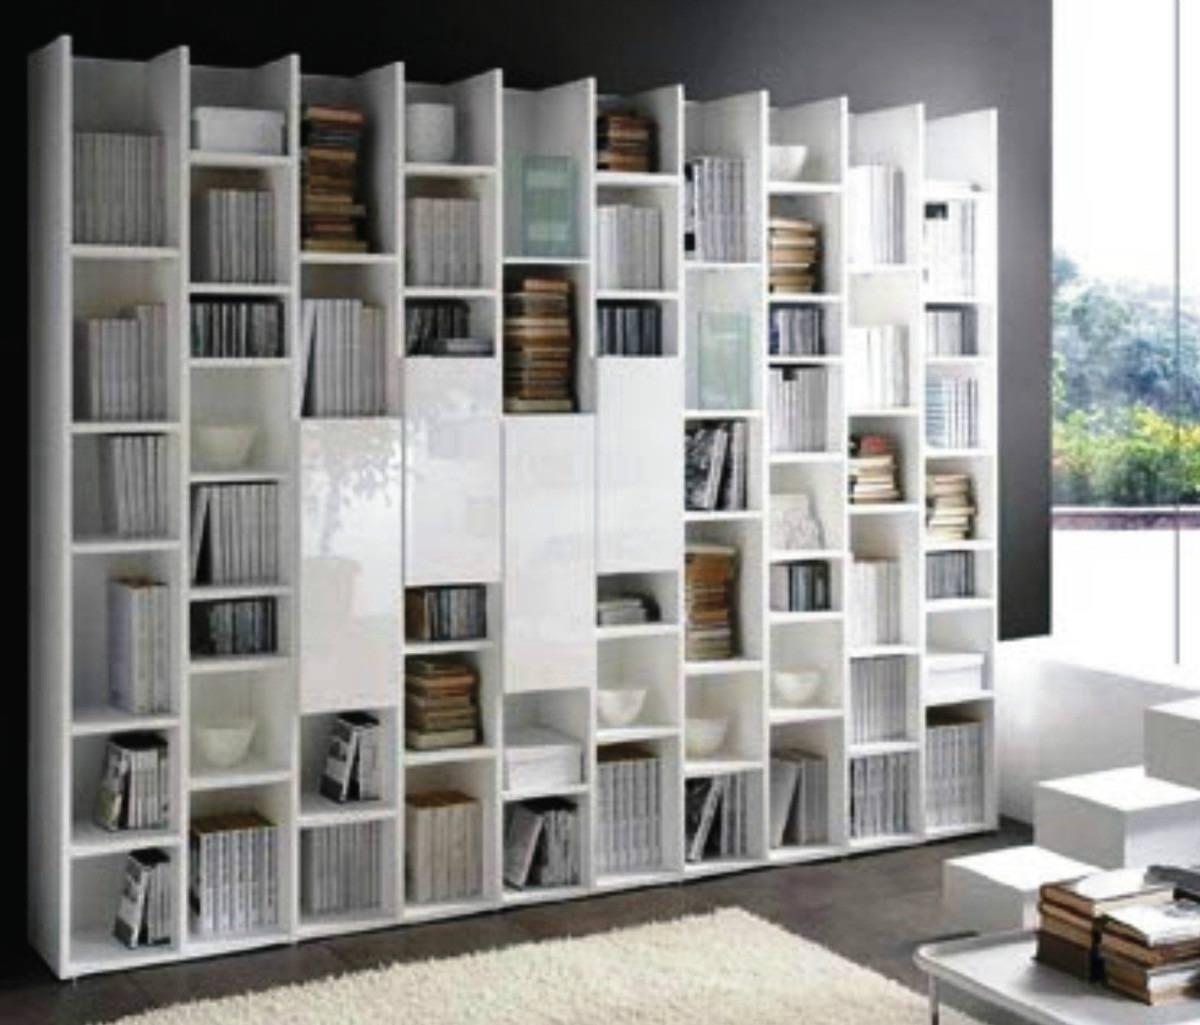 diseño-bibliotecas-fotos-modelo-blanco-moderno